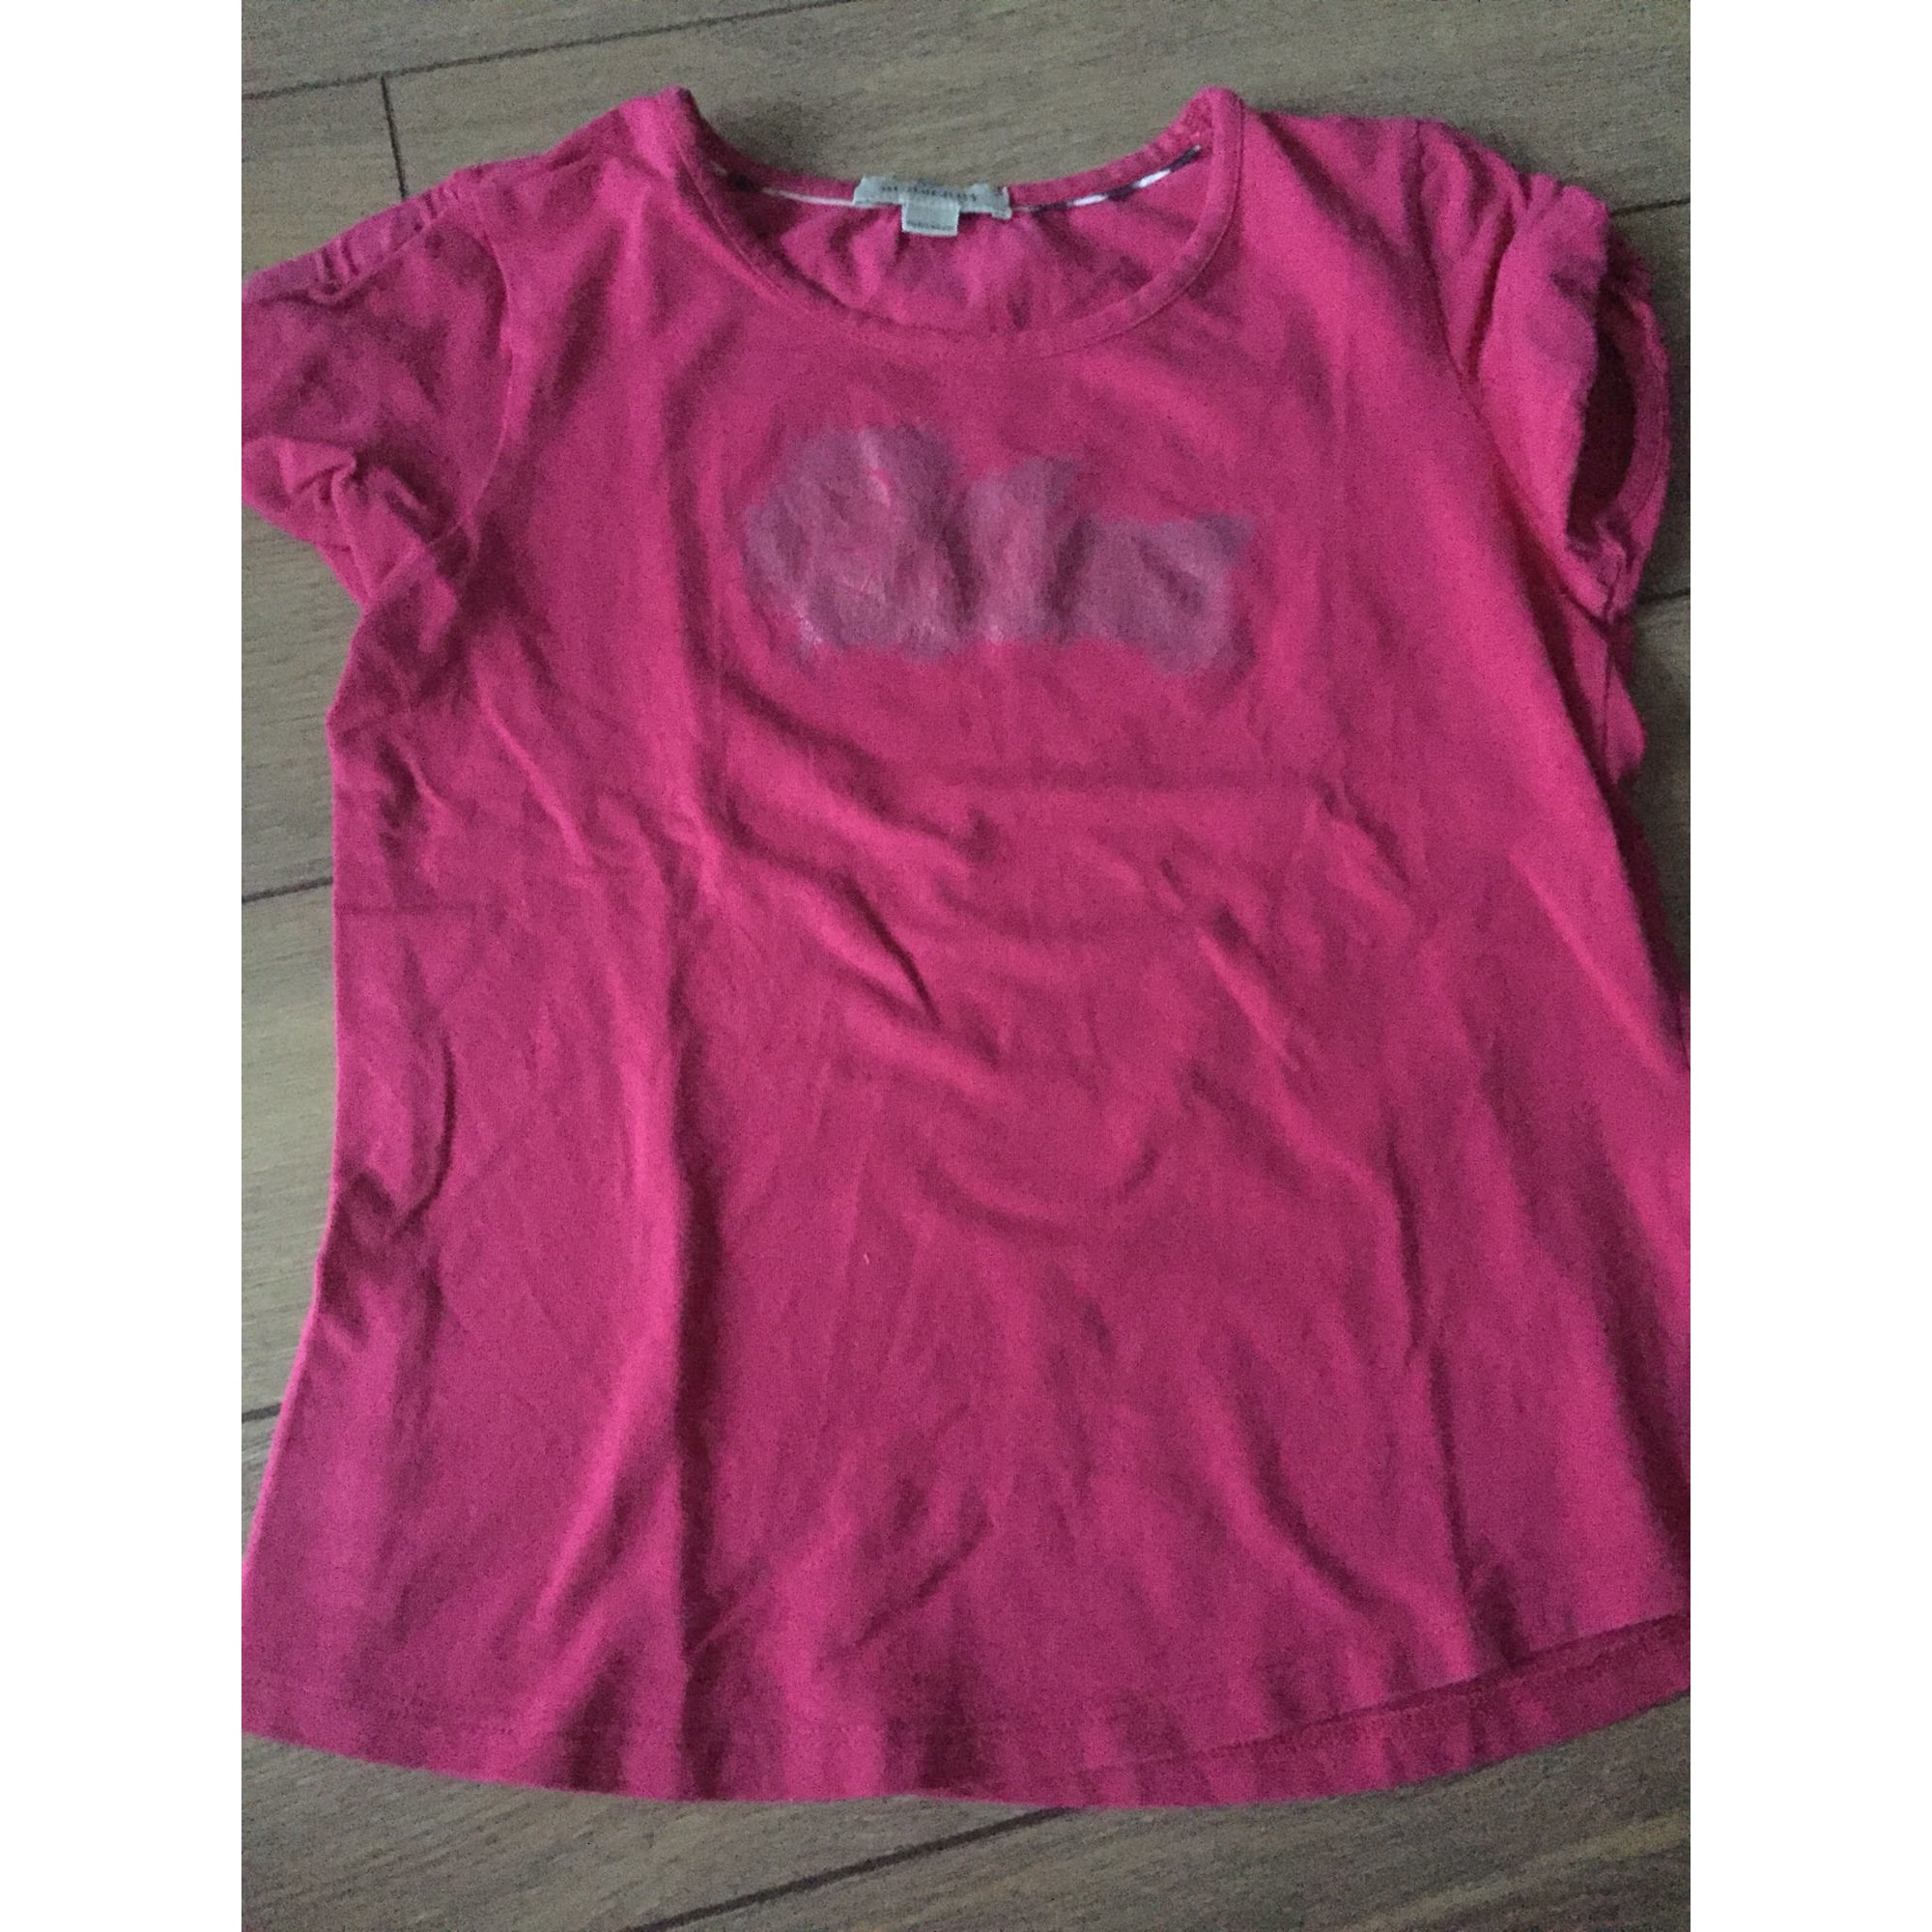 Top, Tee-shirt BURBERRY Rose, fuschia, vieux rose